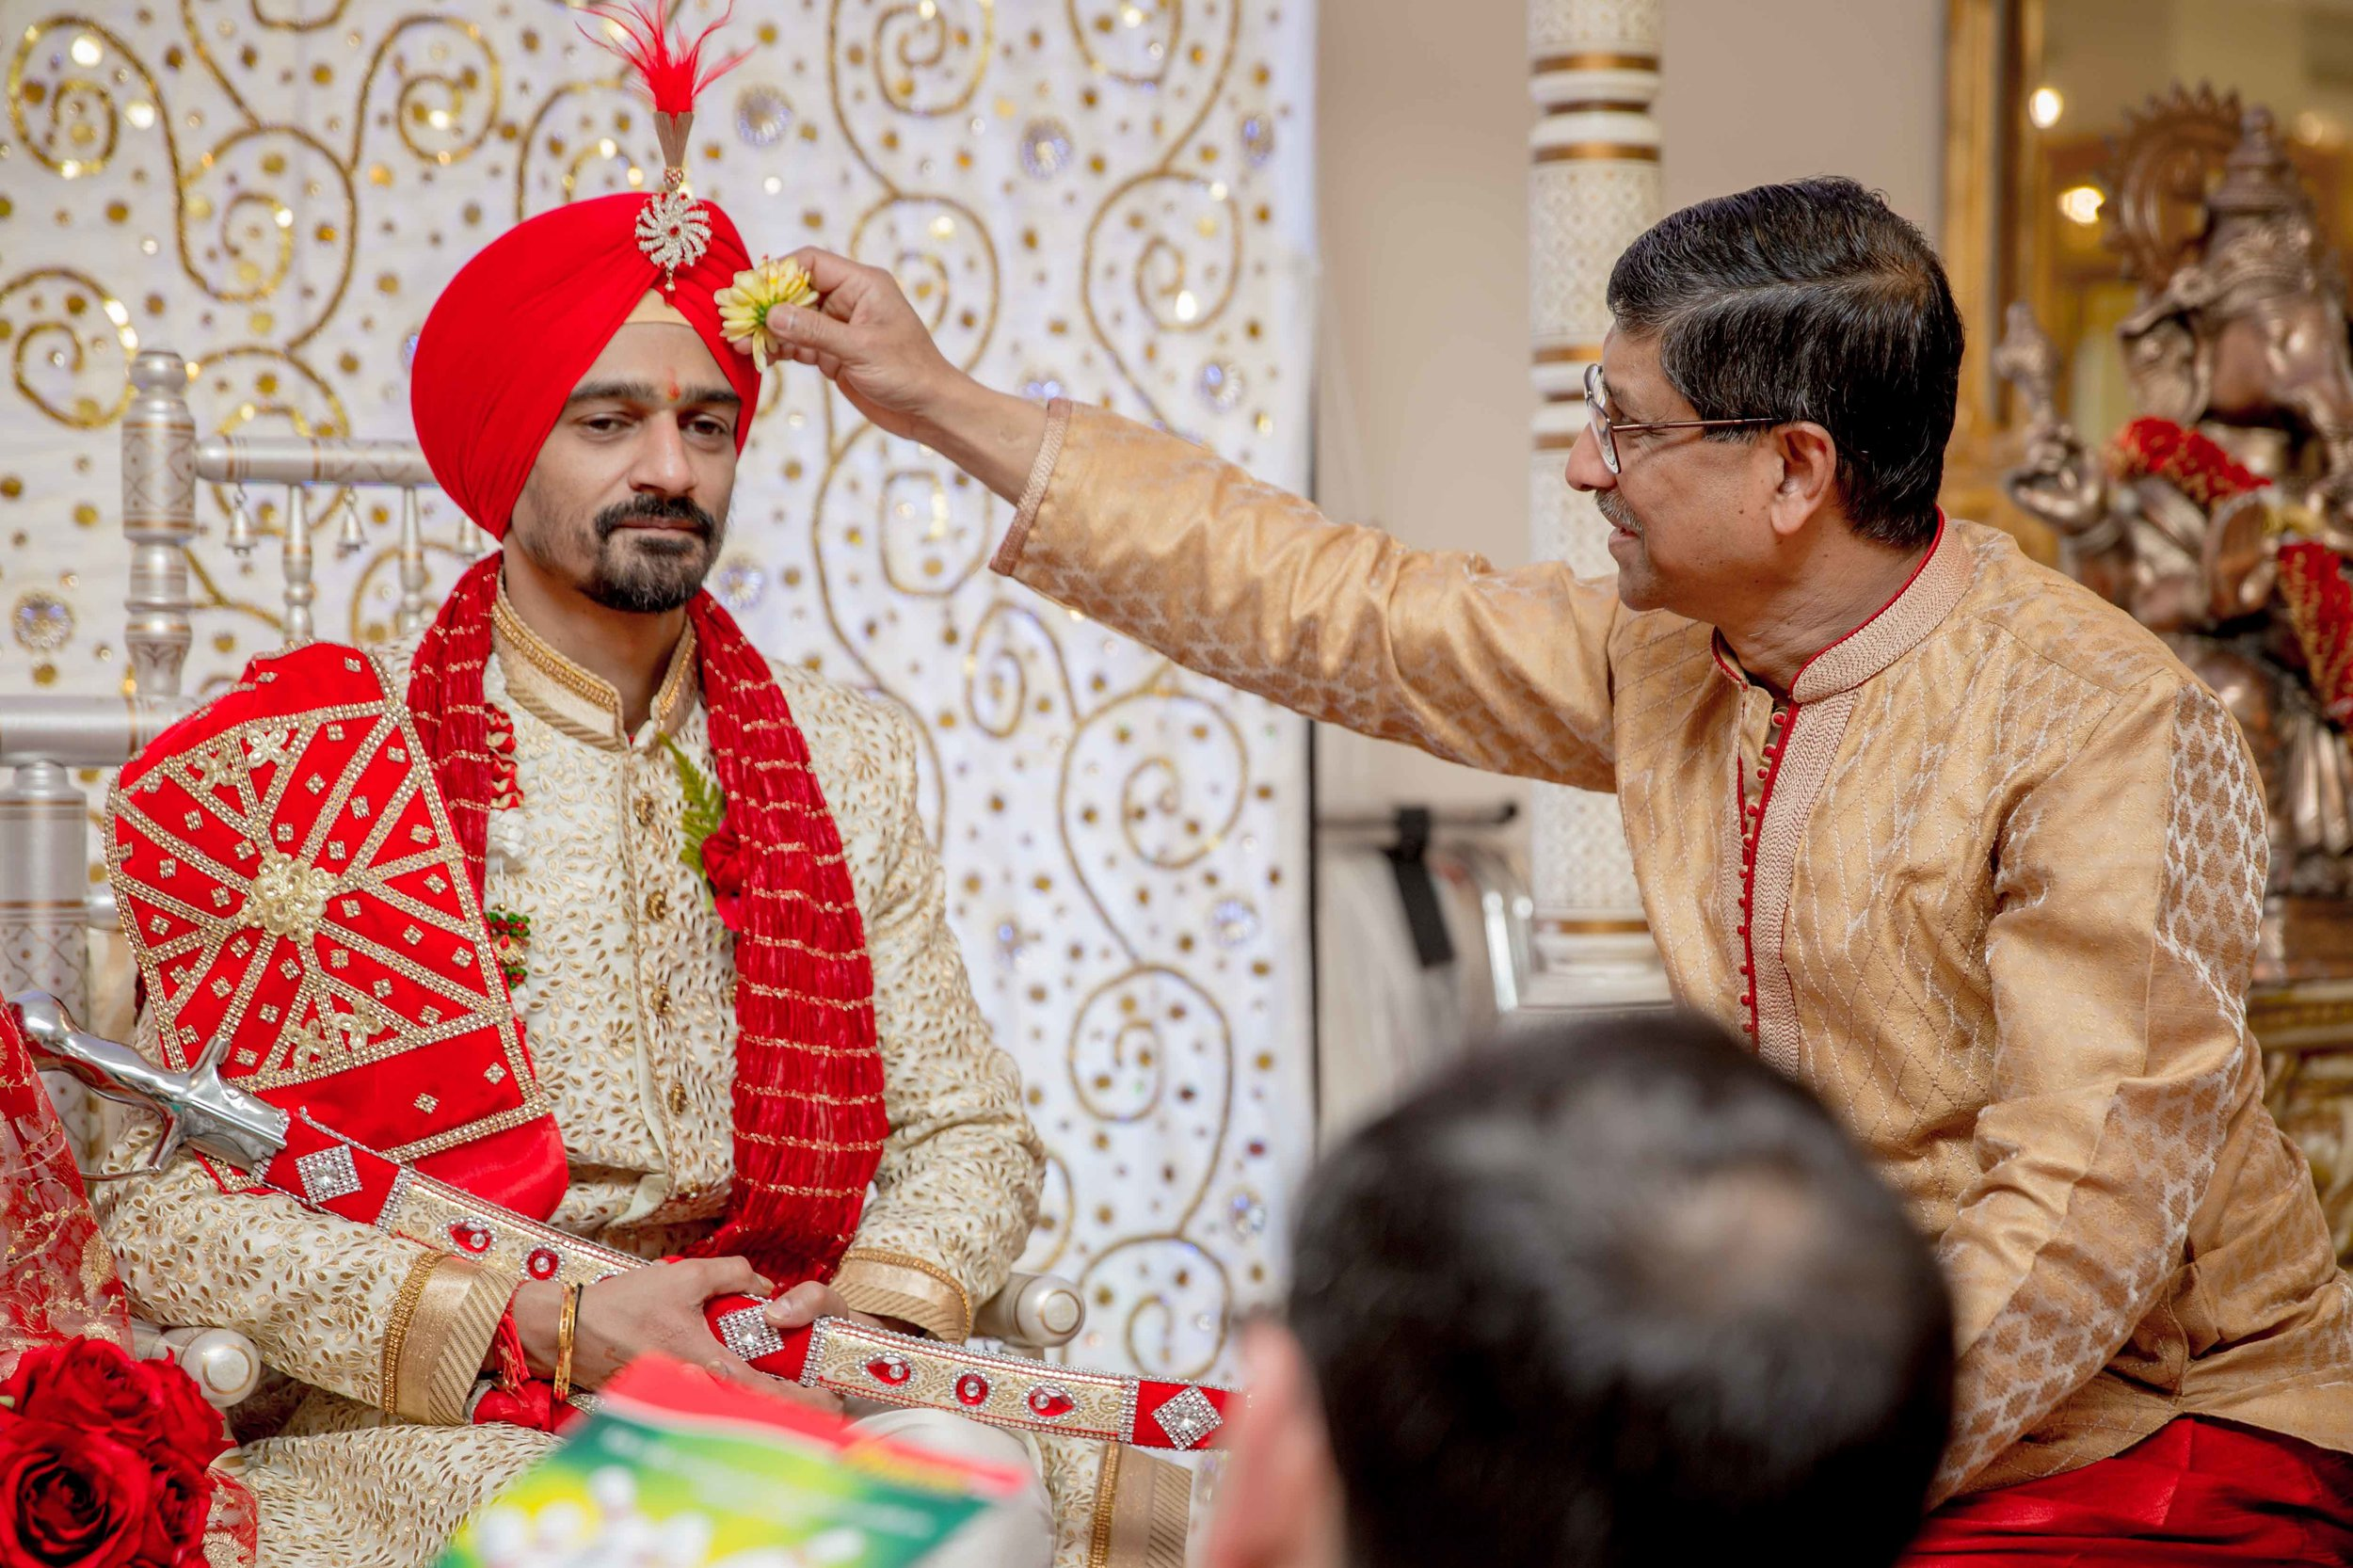 ramada-park-hall-hotel-birmingham-wolverhampton-hindu-wedding-asian-wedding-photography-natalia-smith-photography-23.jpg